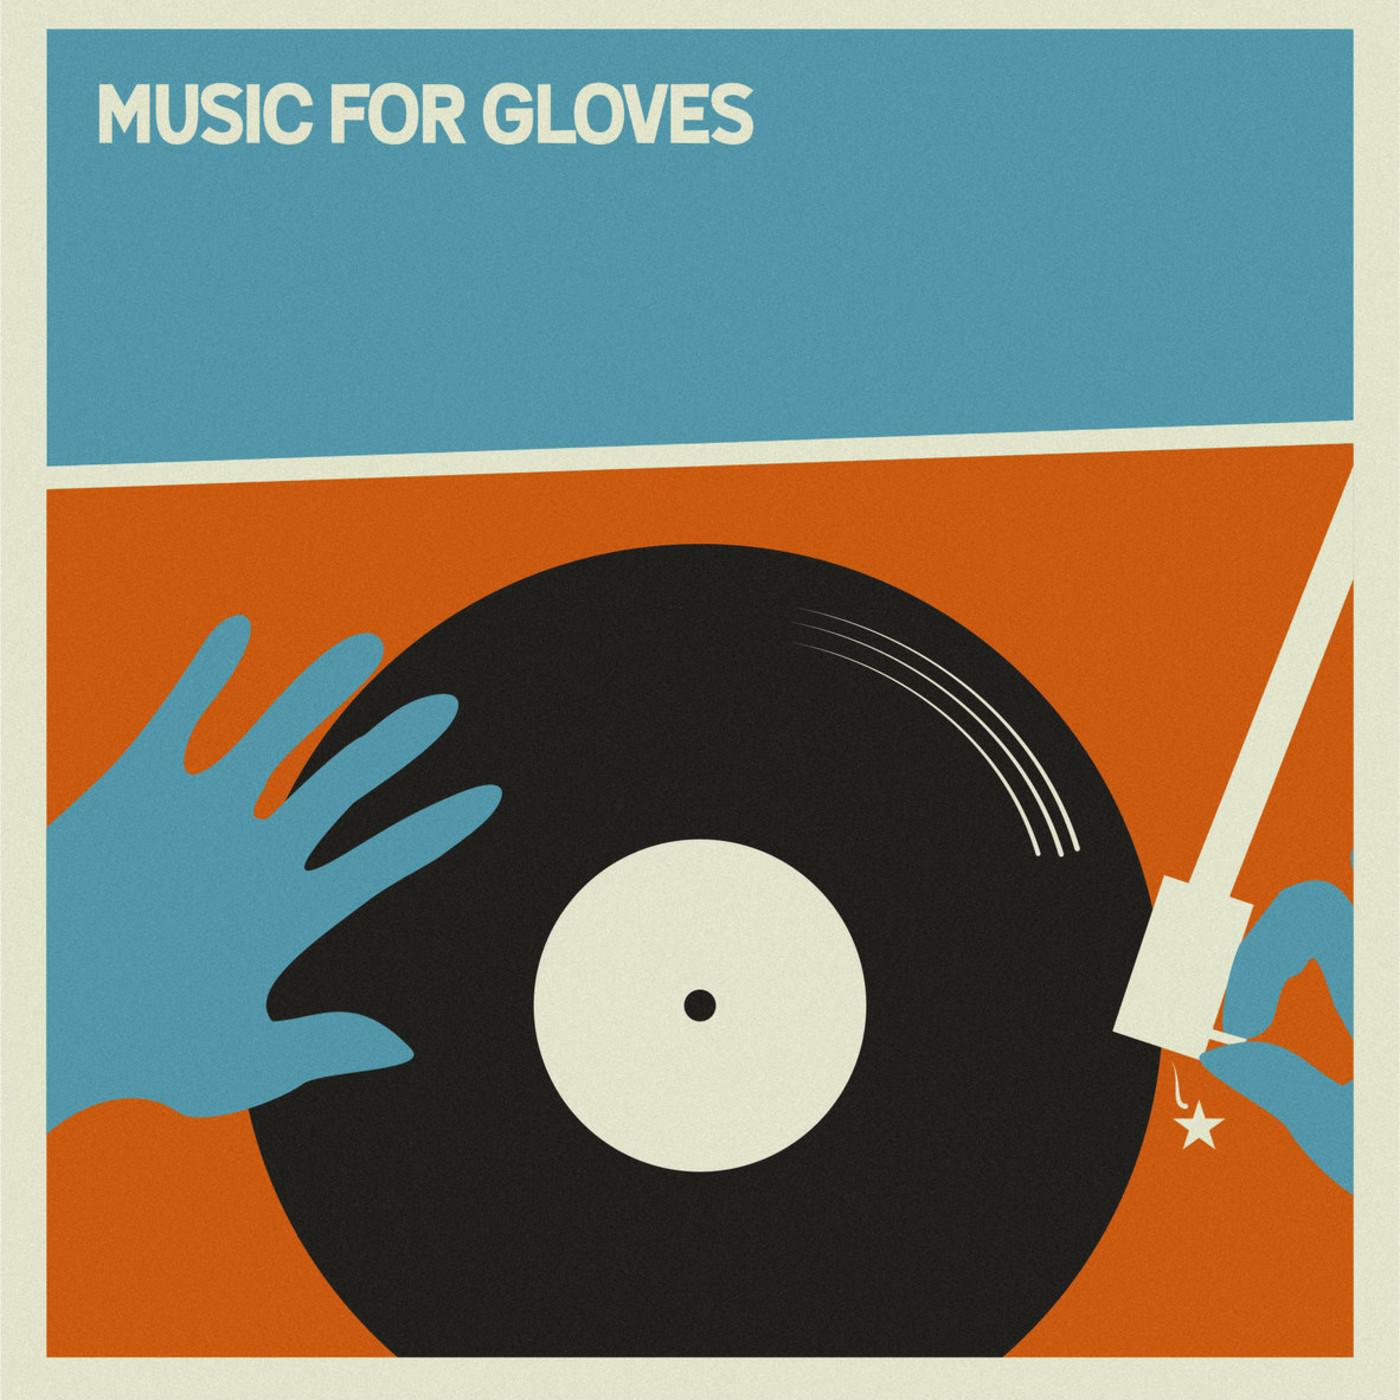 Music for gloves, guantes por canciones (10/04/2020)